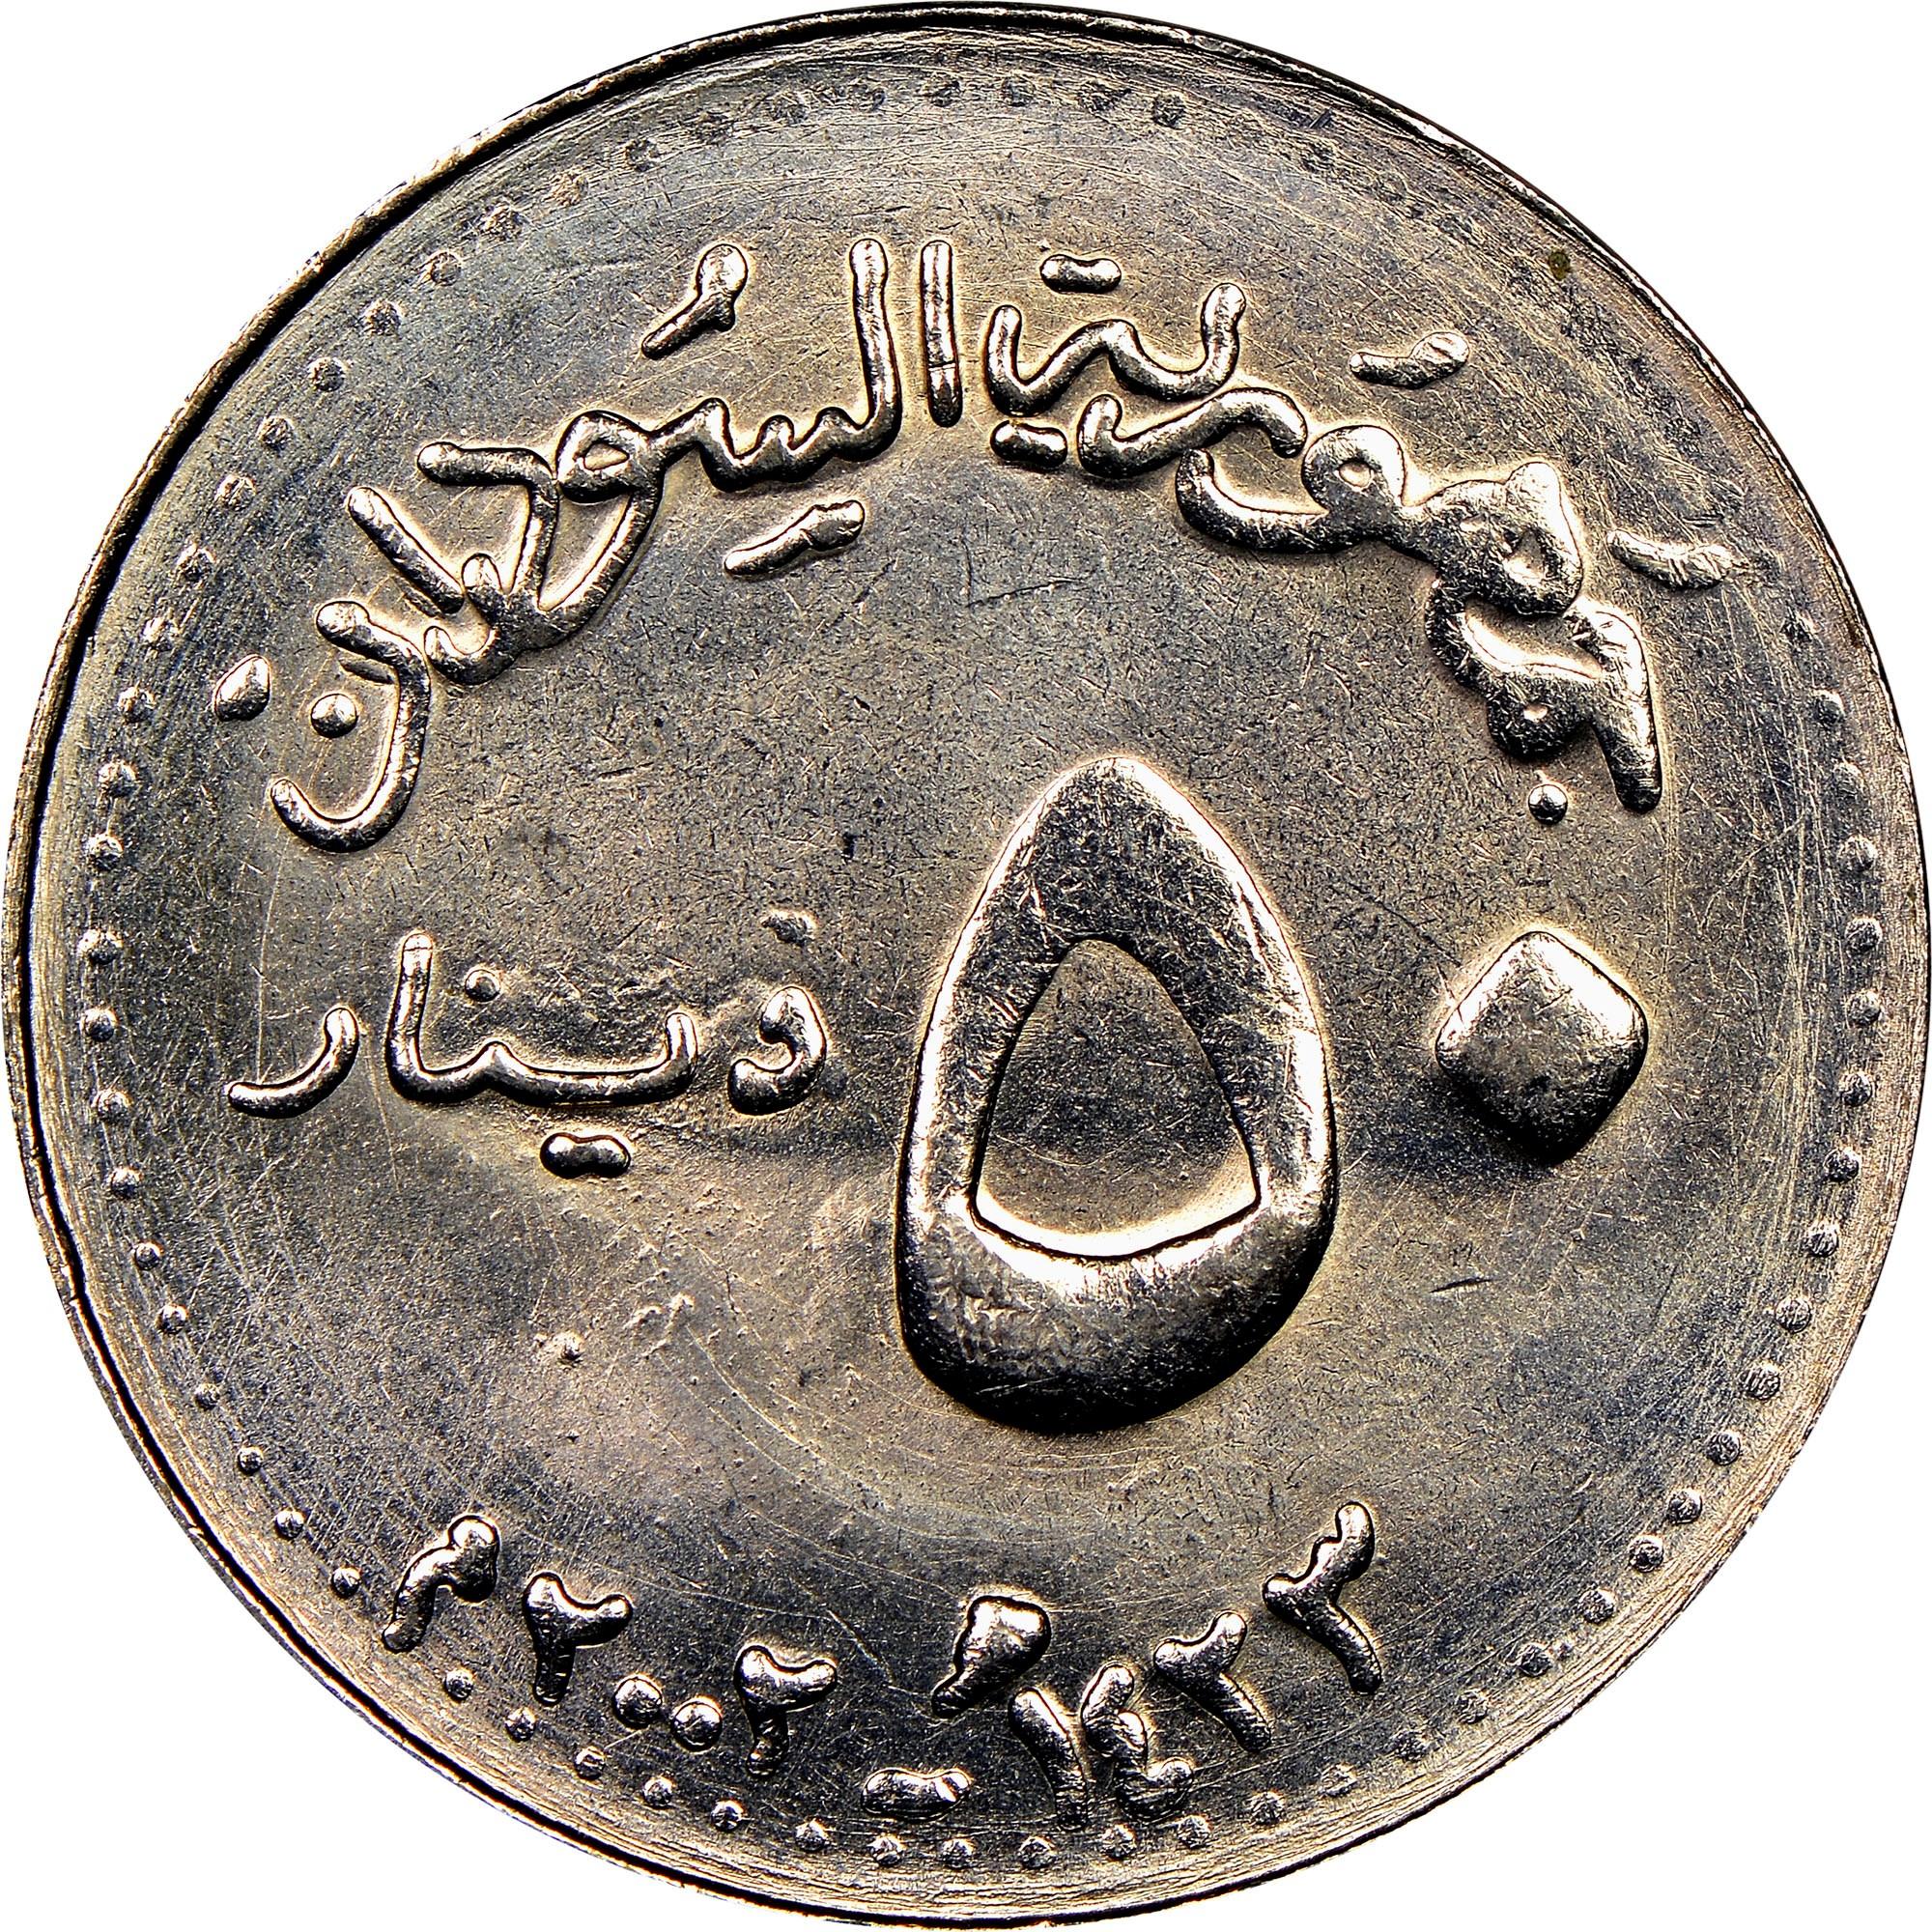 Sudan 50 Dinars obverse